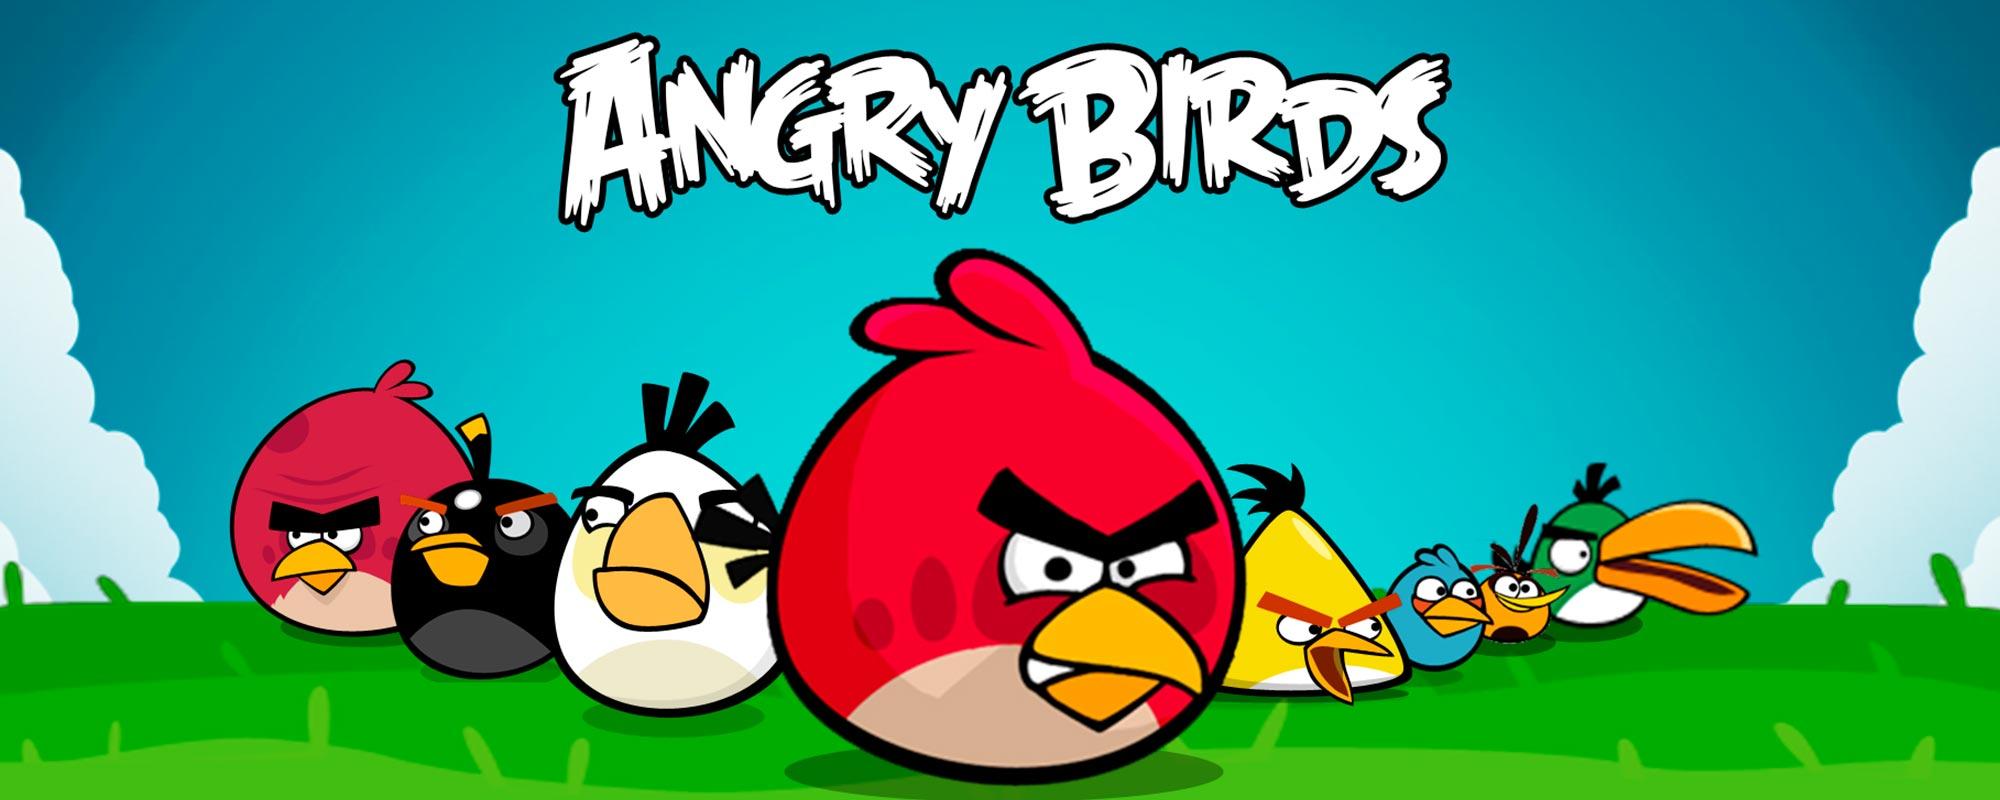 Angry Birds dibujos para colorear